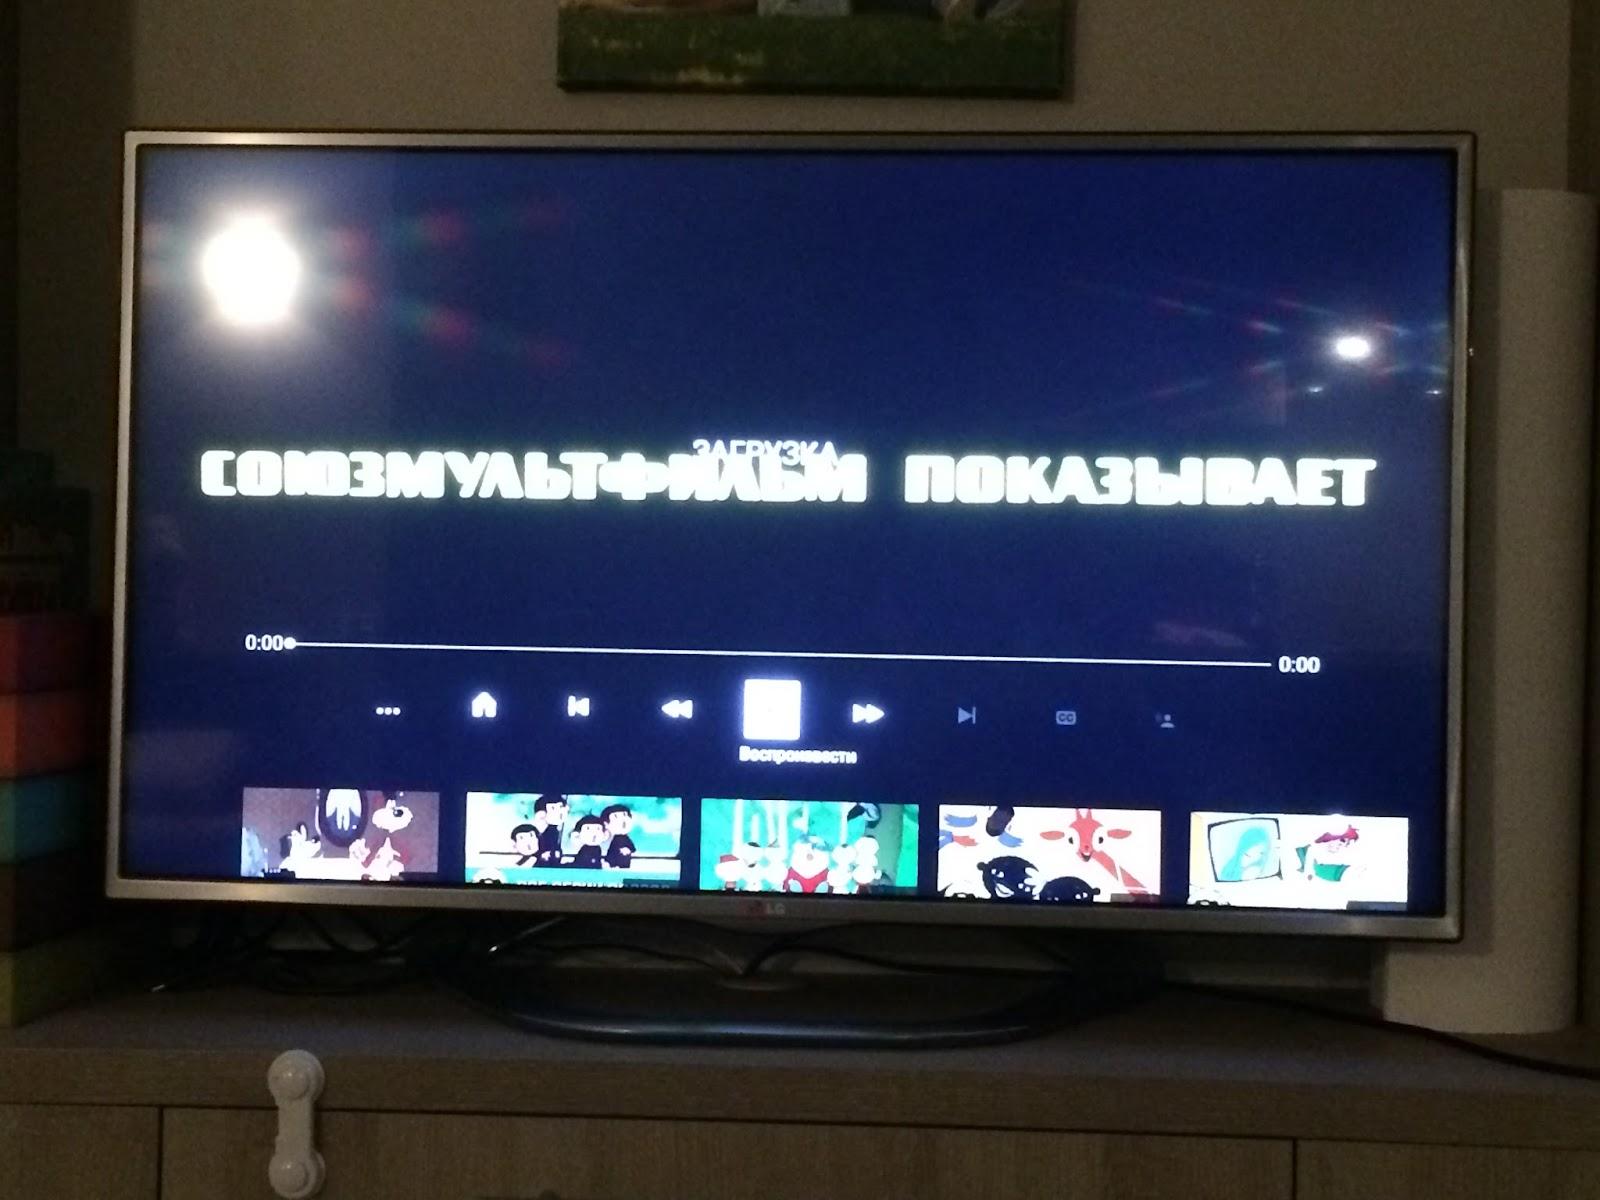 YouTube LG Smart TV app crops the video width - YouTube Help